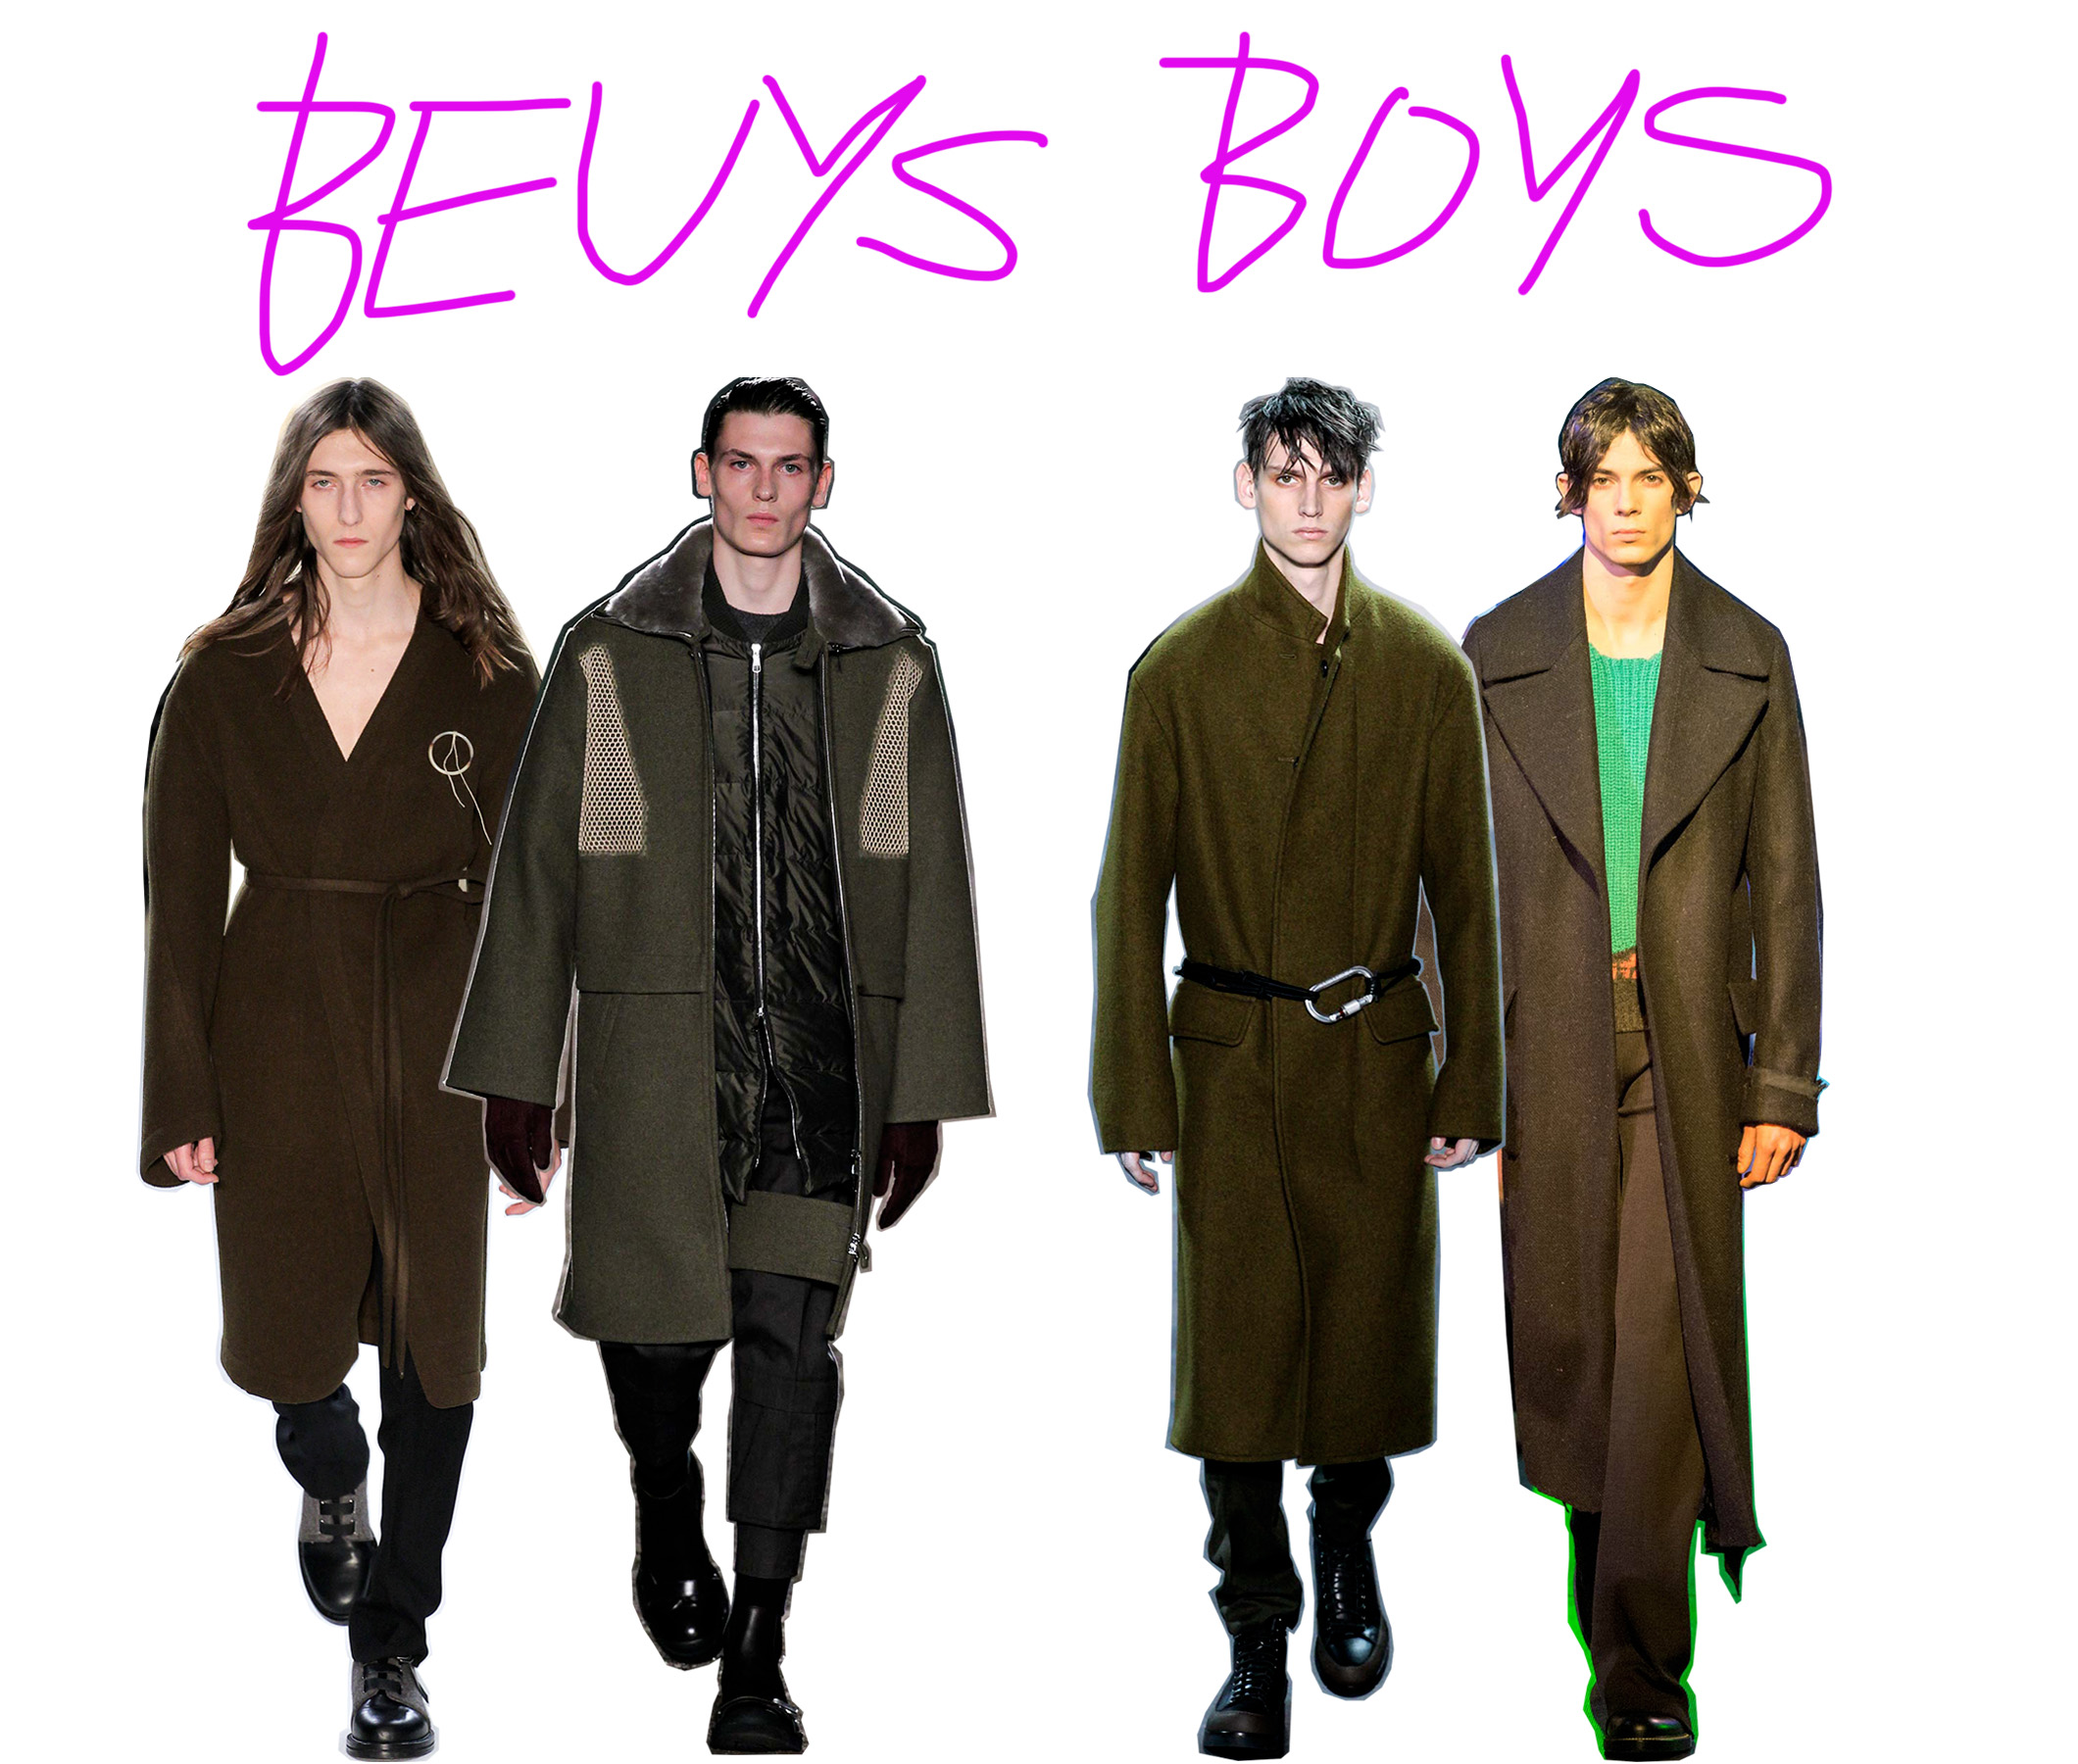 BeuysBoys-Final